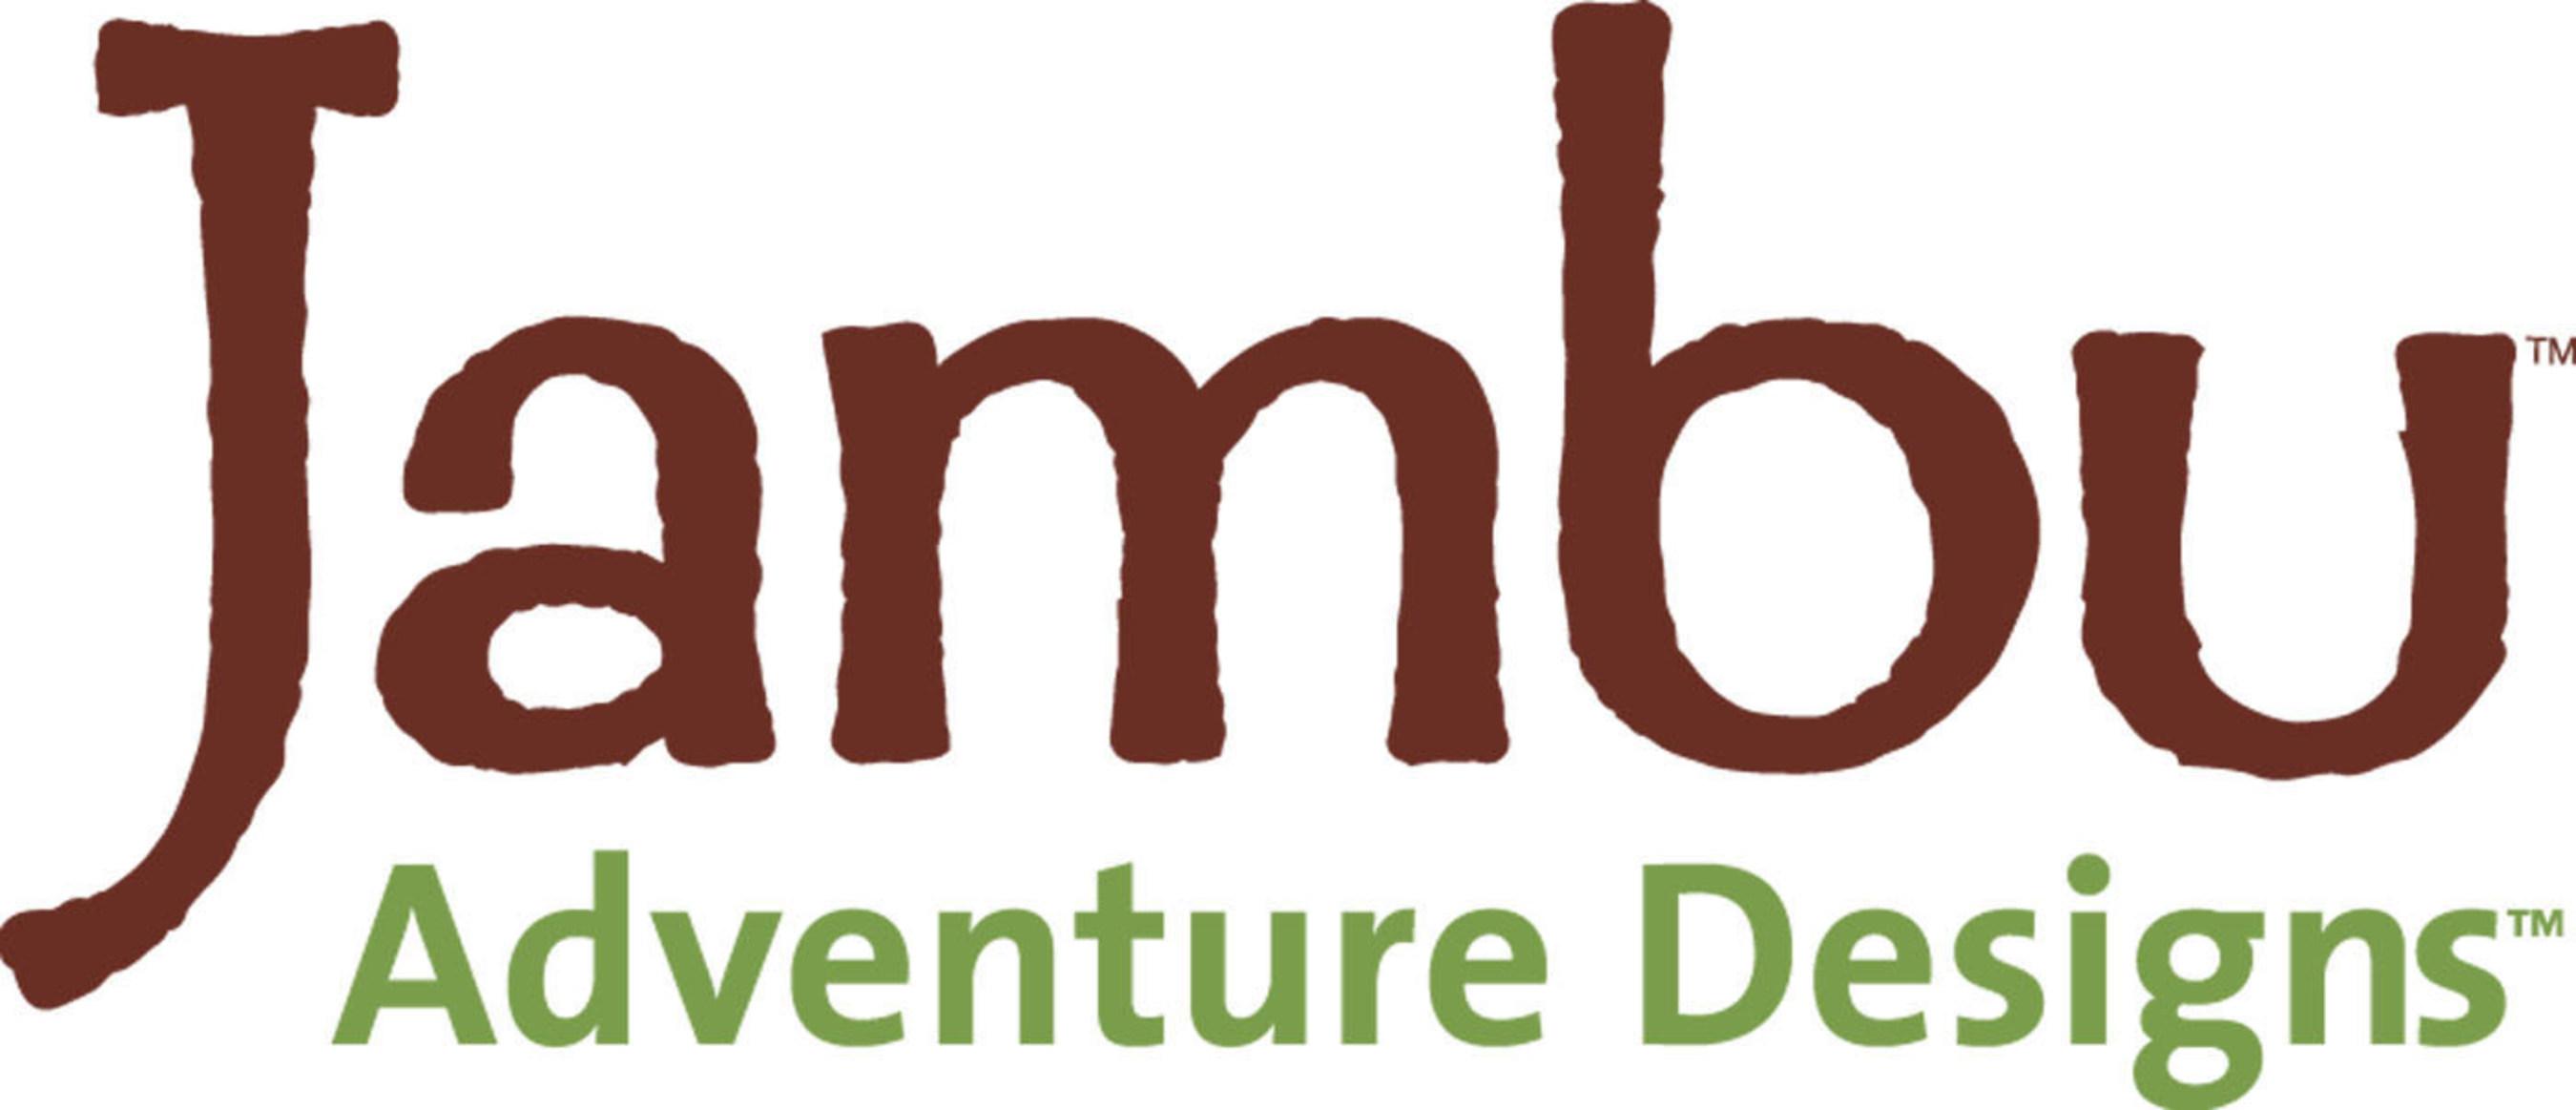 Jambu Footwear Launches eCommerce Shop! Enhanced digital platform showcases Jambu adventure and fashion ...